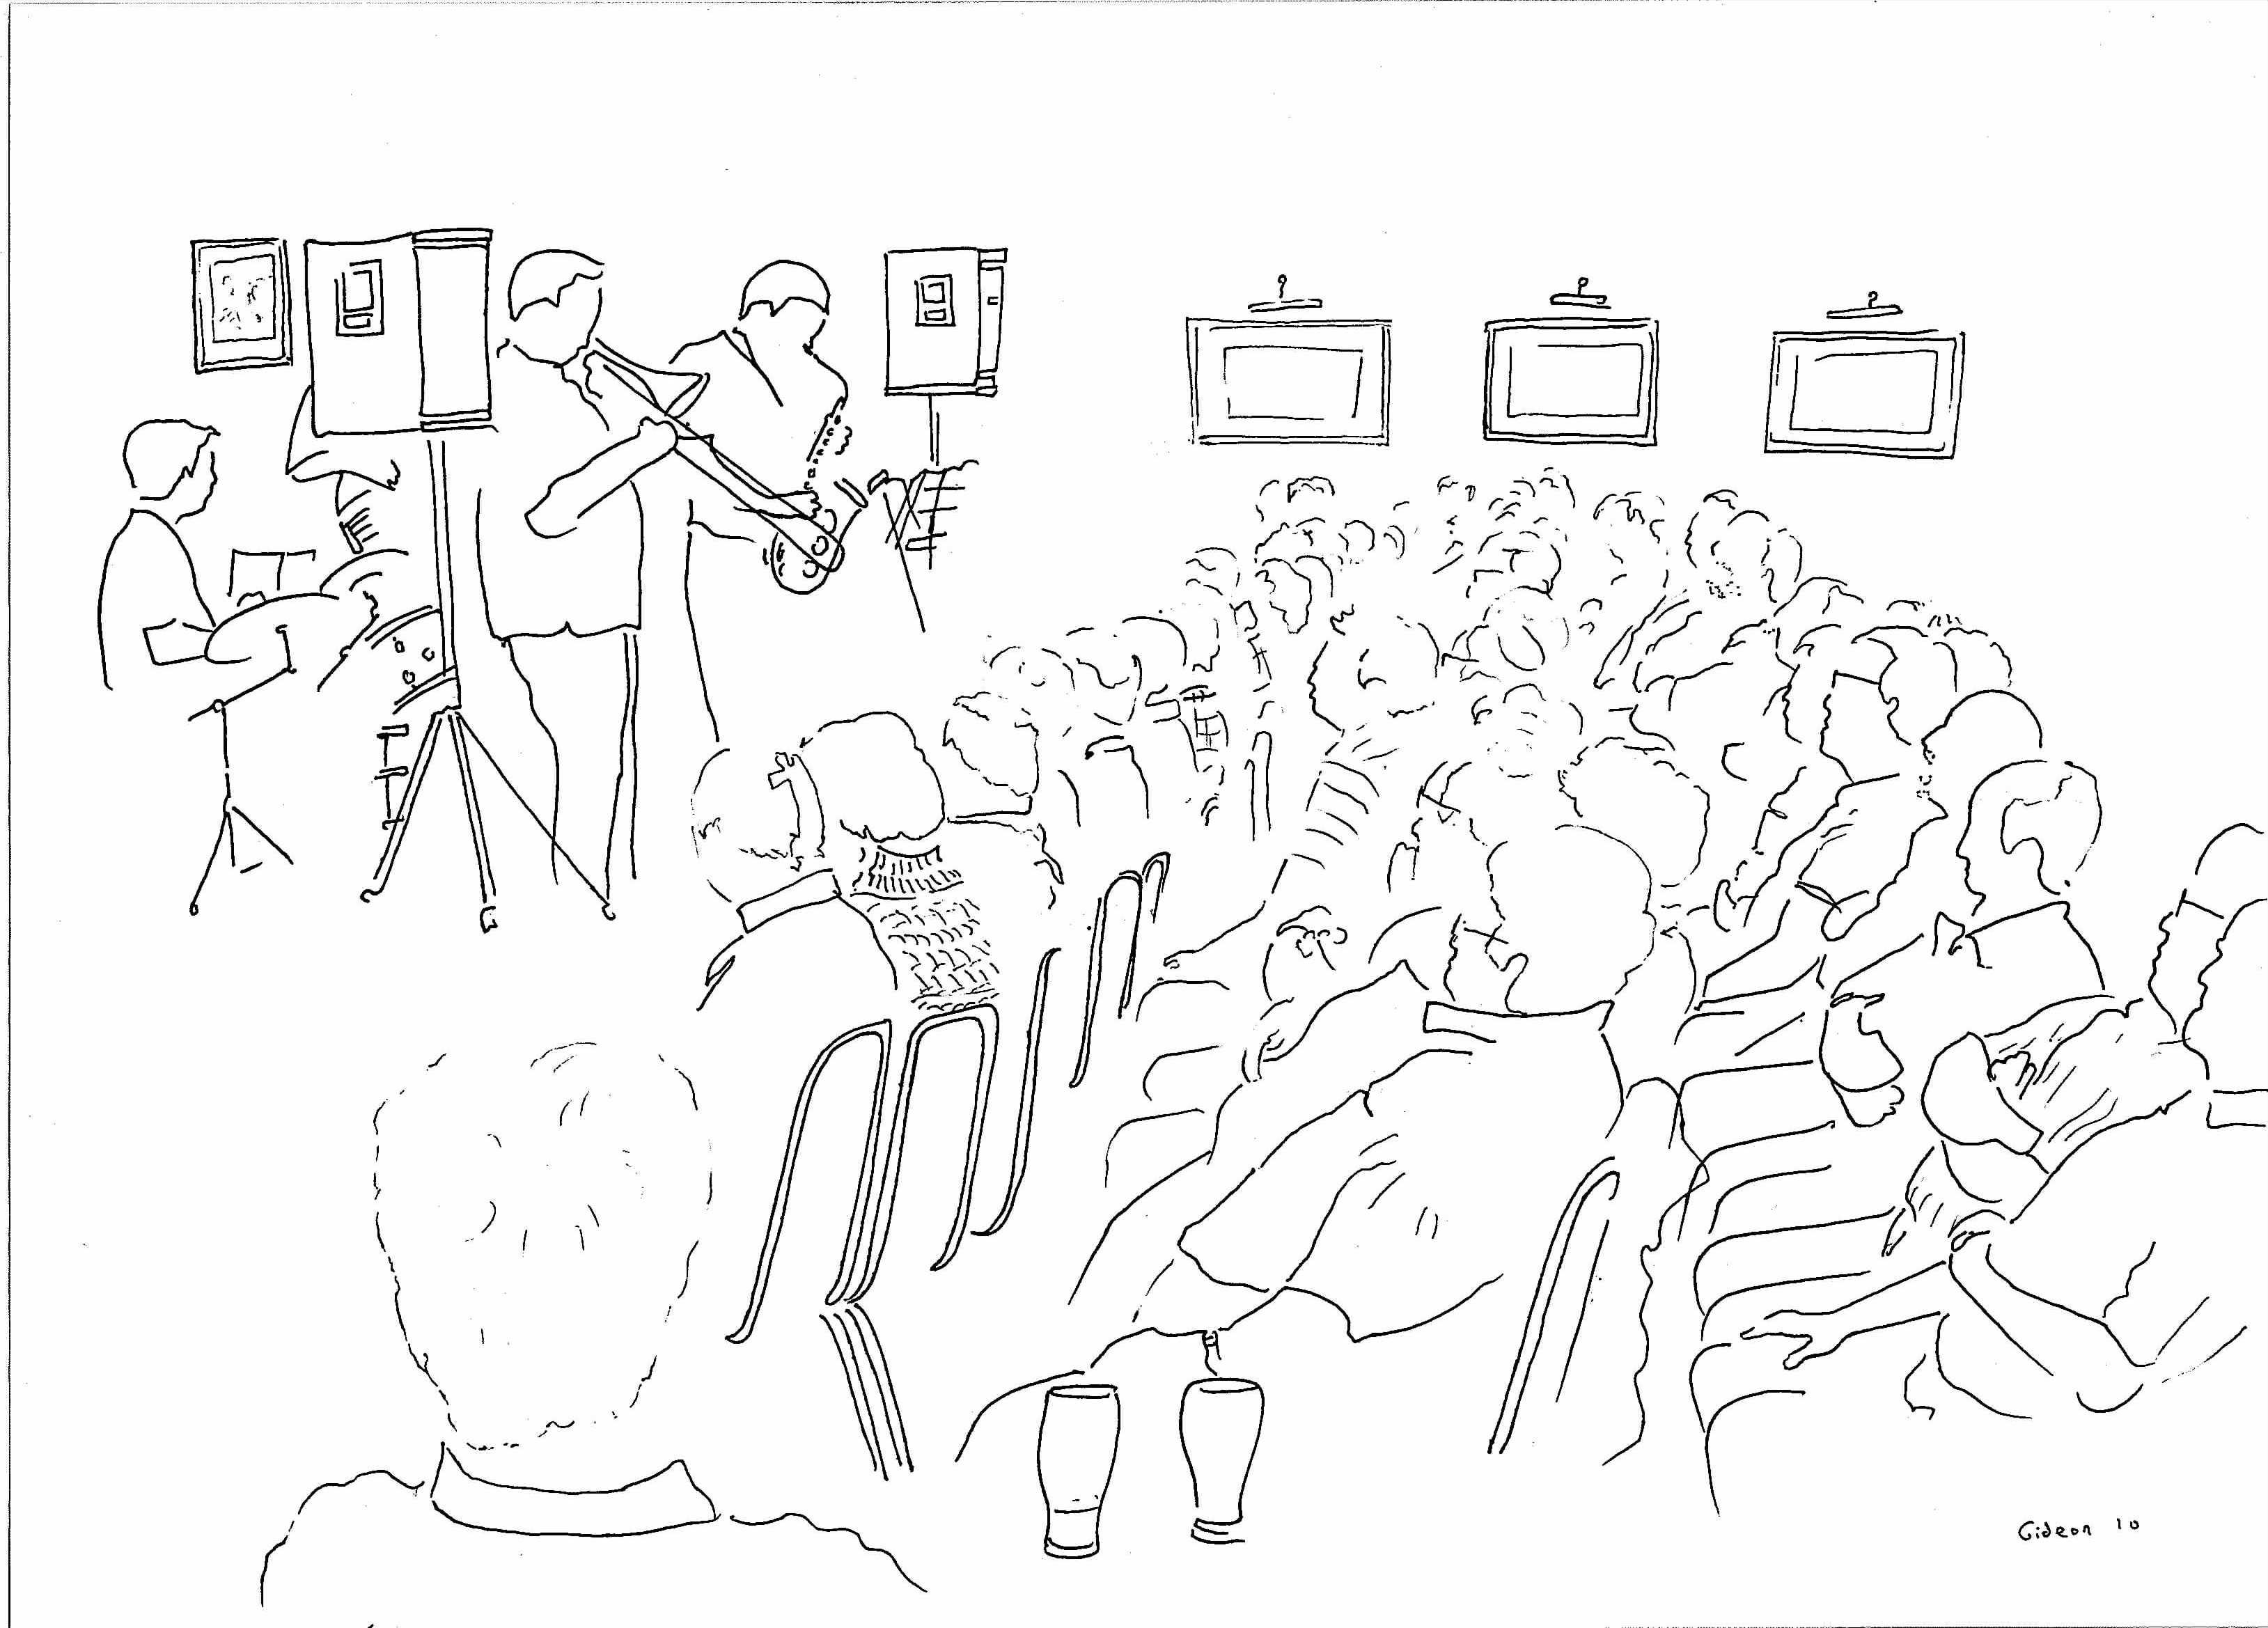 3257x2338 Wigan Jazz Festival Drawing Gideon Conn